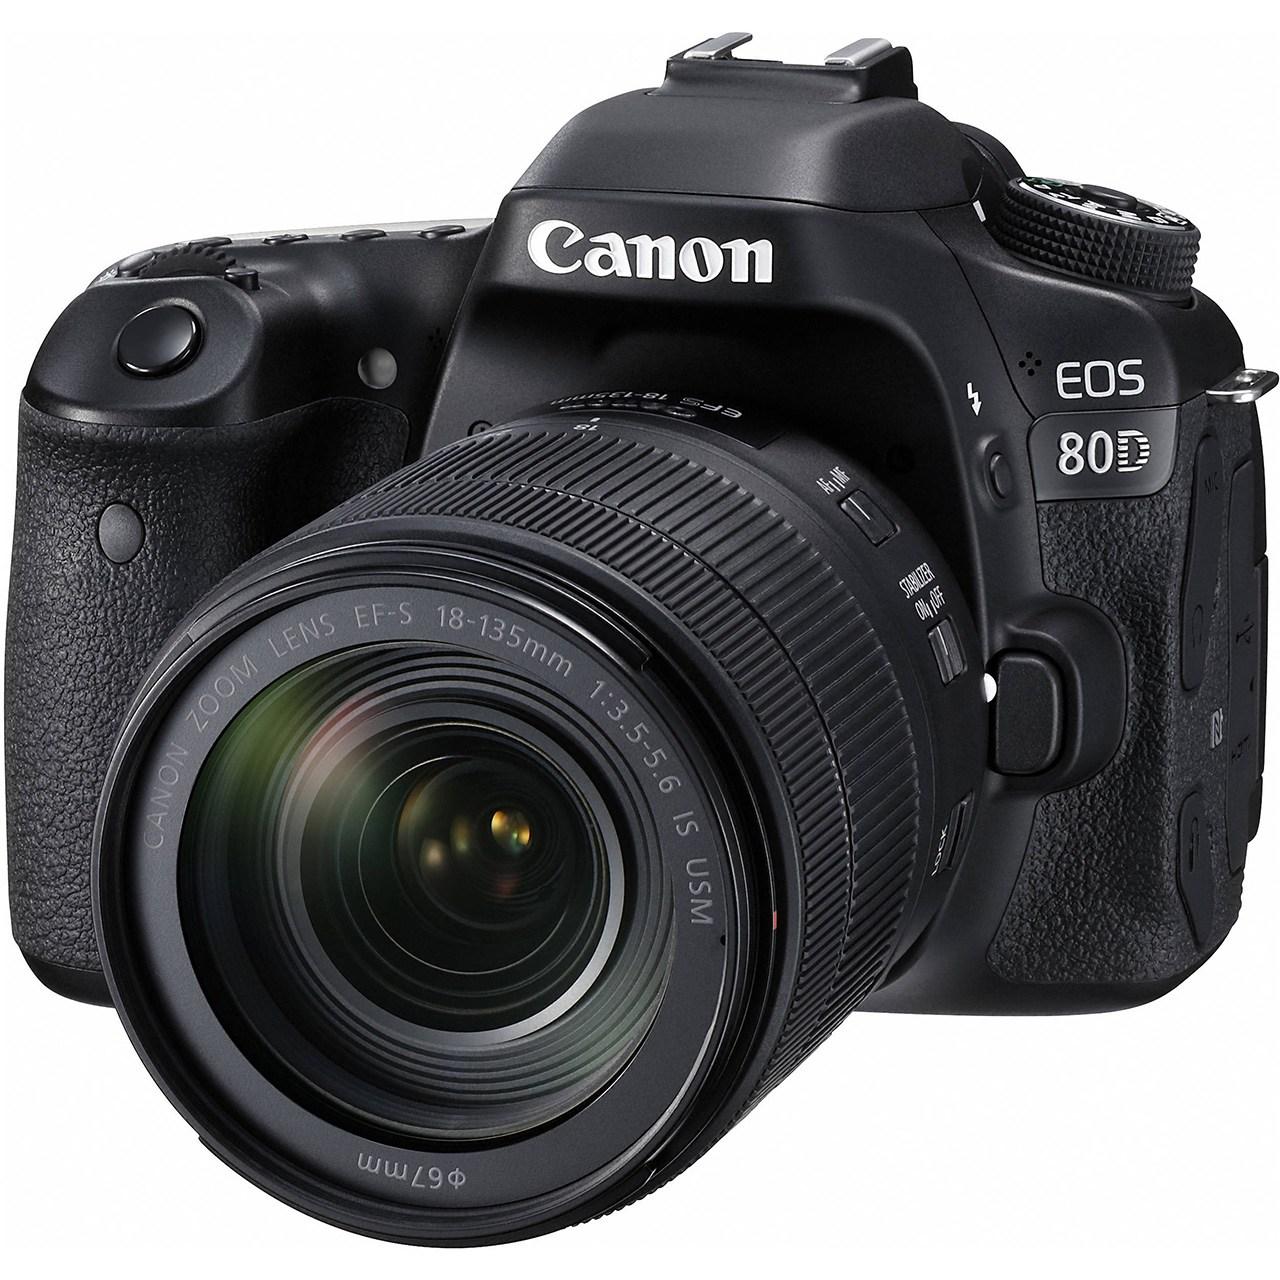 دوربین دیجیتال کانن مدل Eos 80D EF S 18-135mm f/3.5-5.6 IS USM Kit